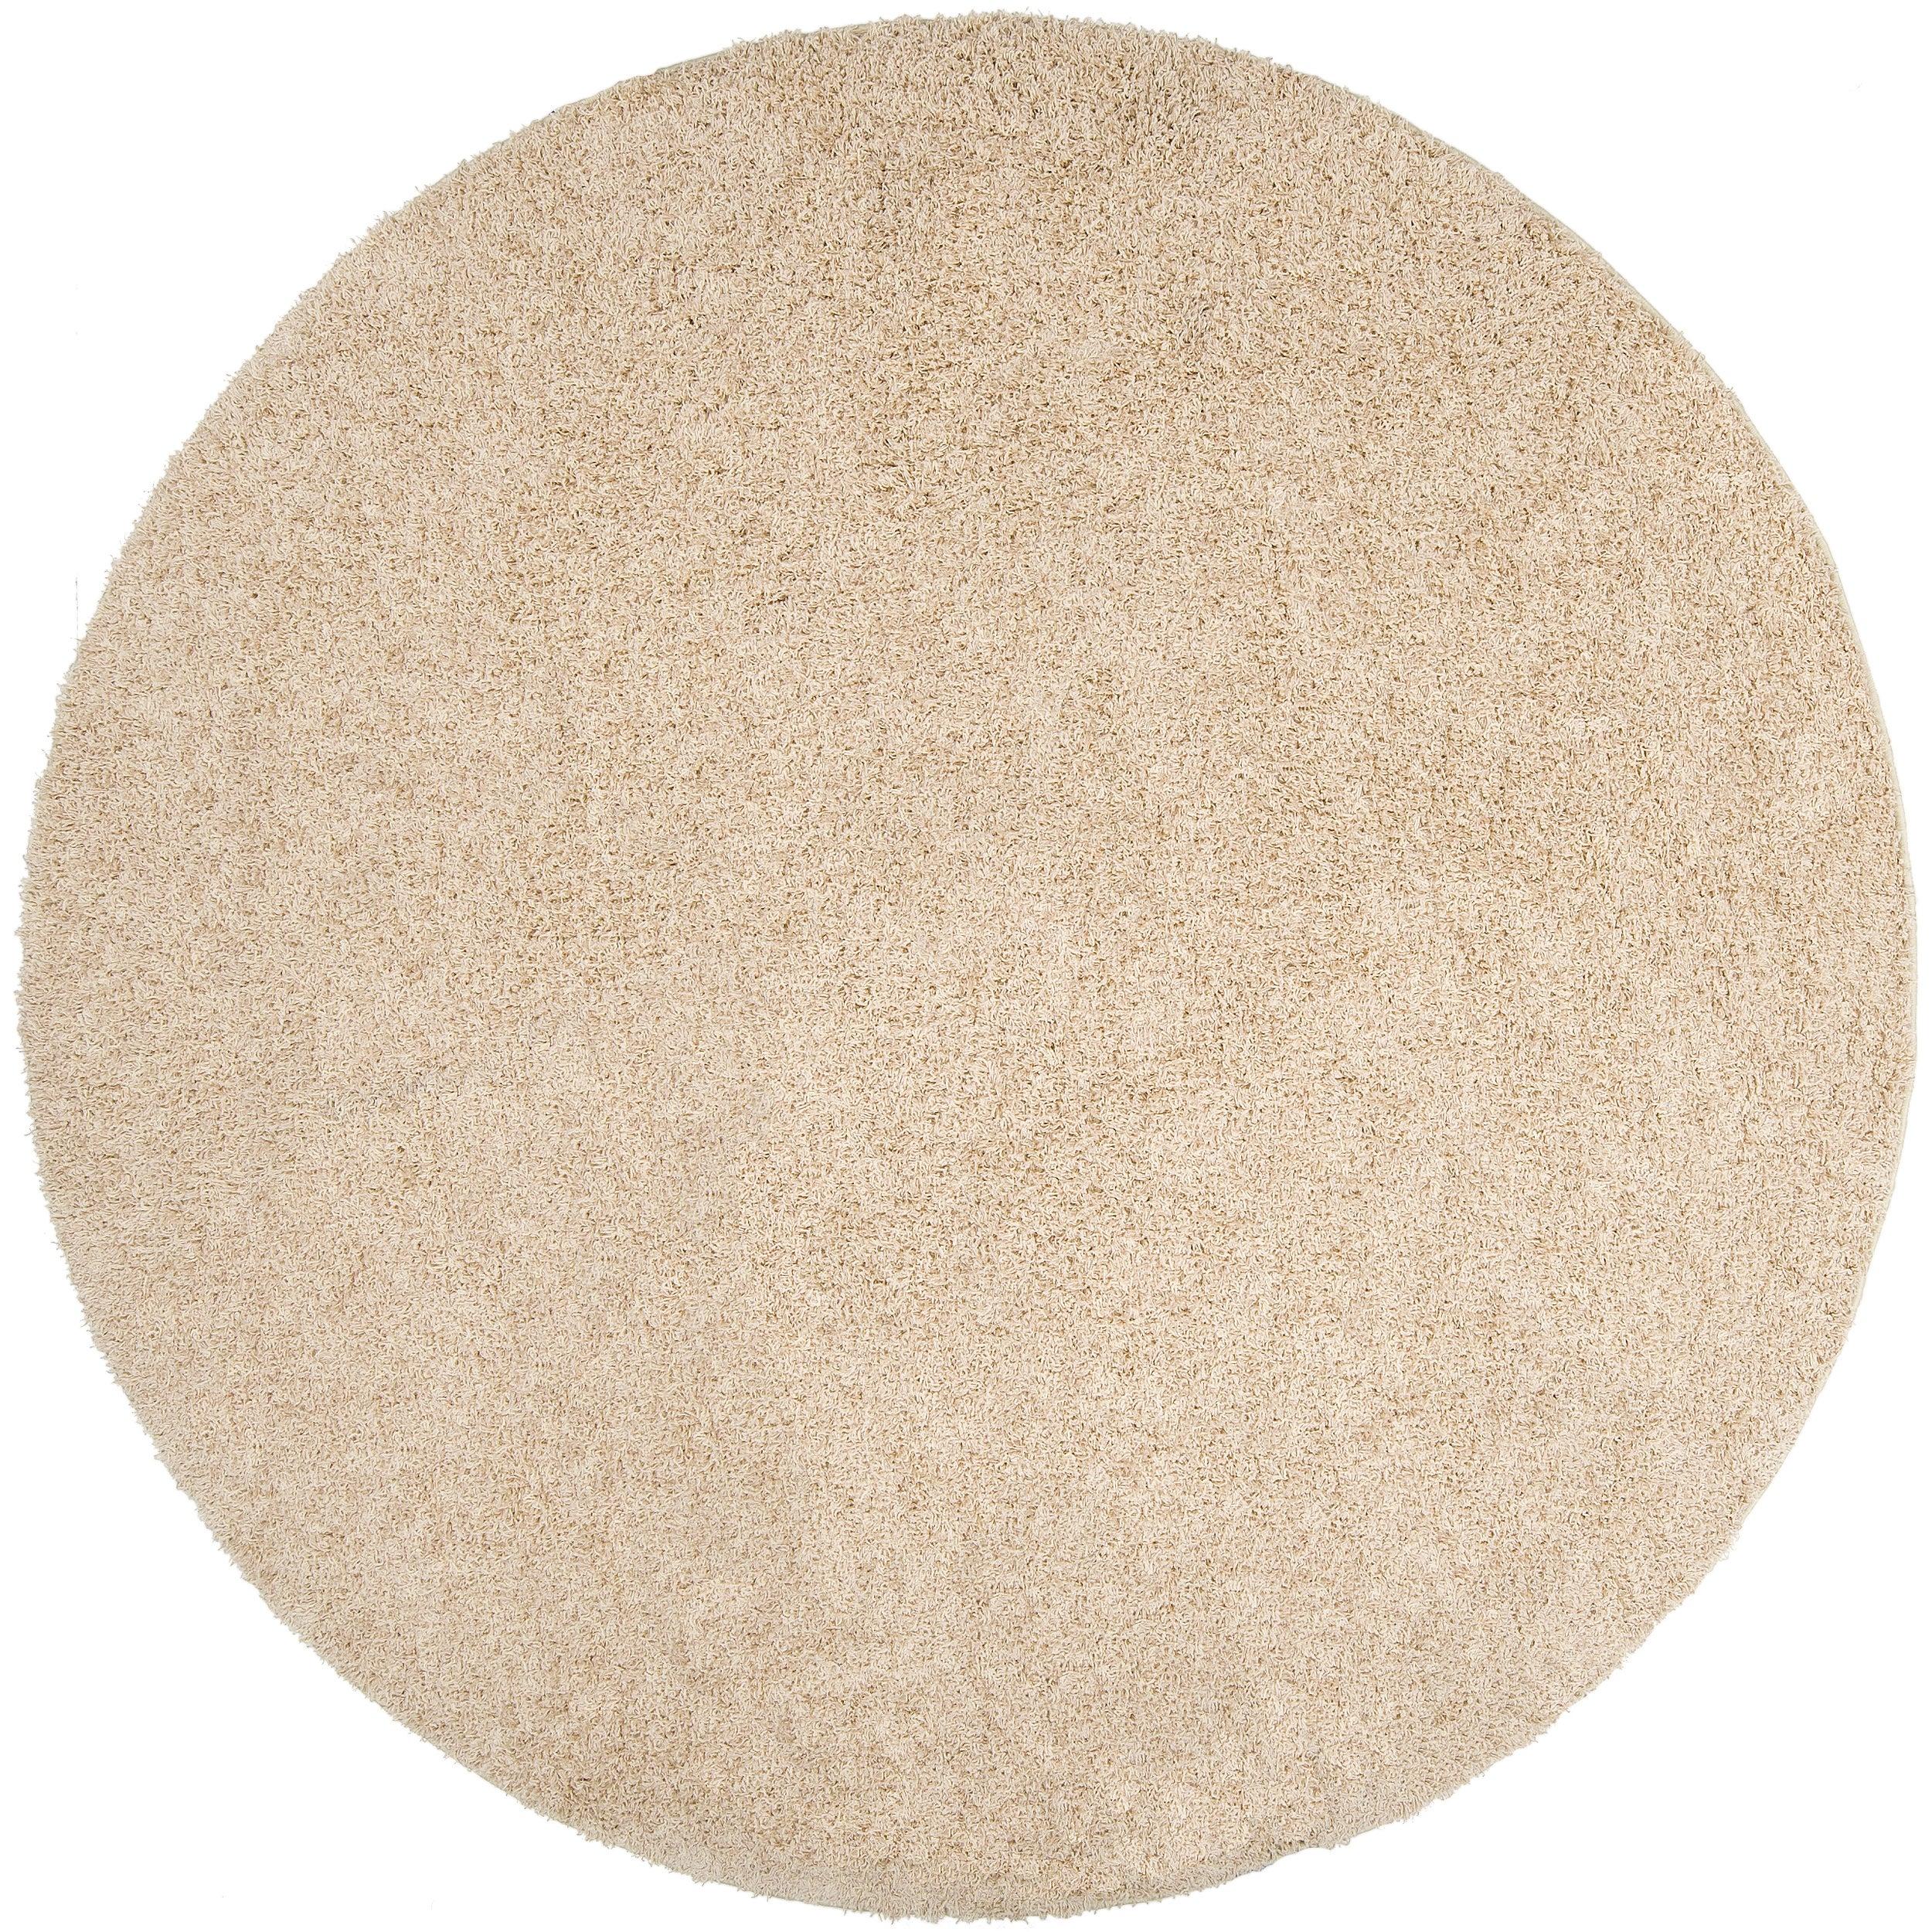 Woven Beige Calucy Plush Shag (4' Round)